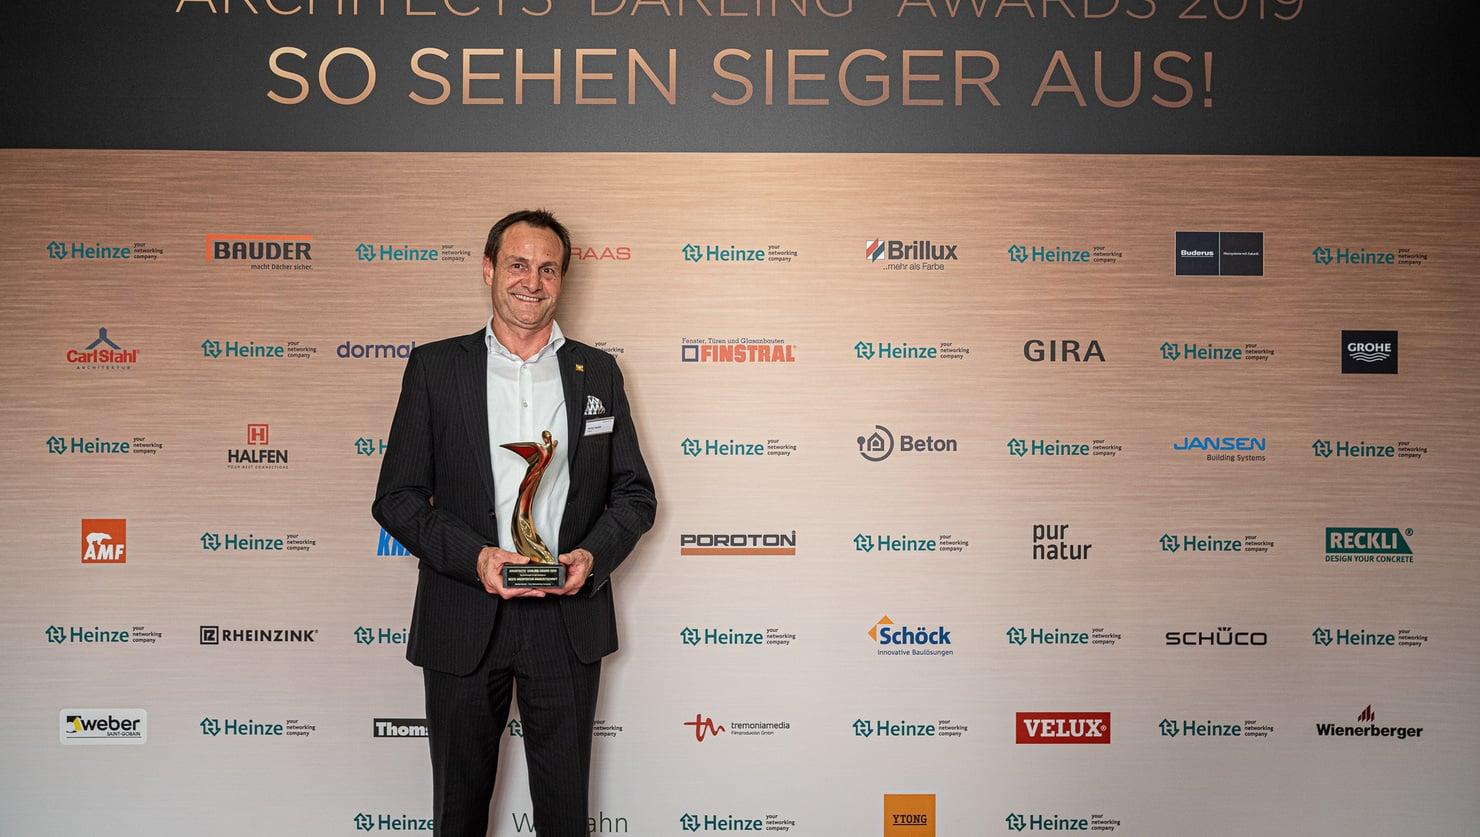 Heinze Architects' Darling Award 2019: